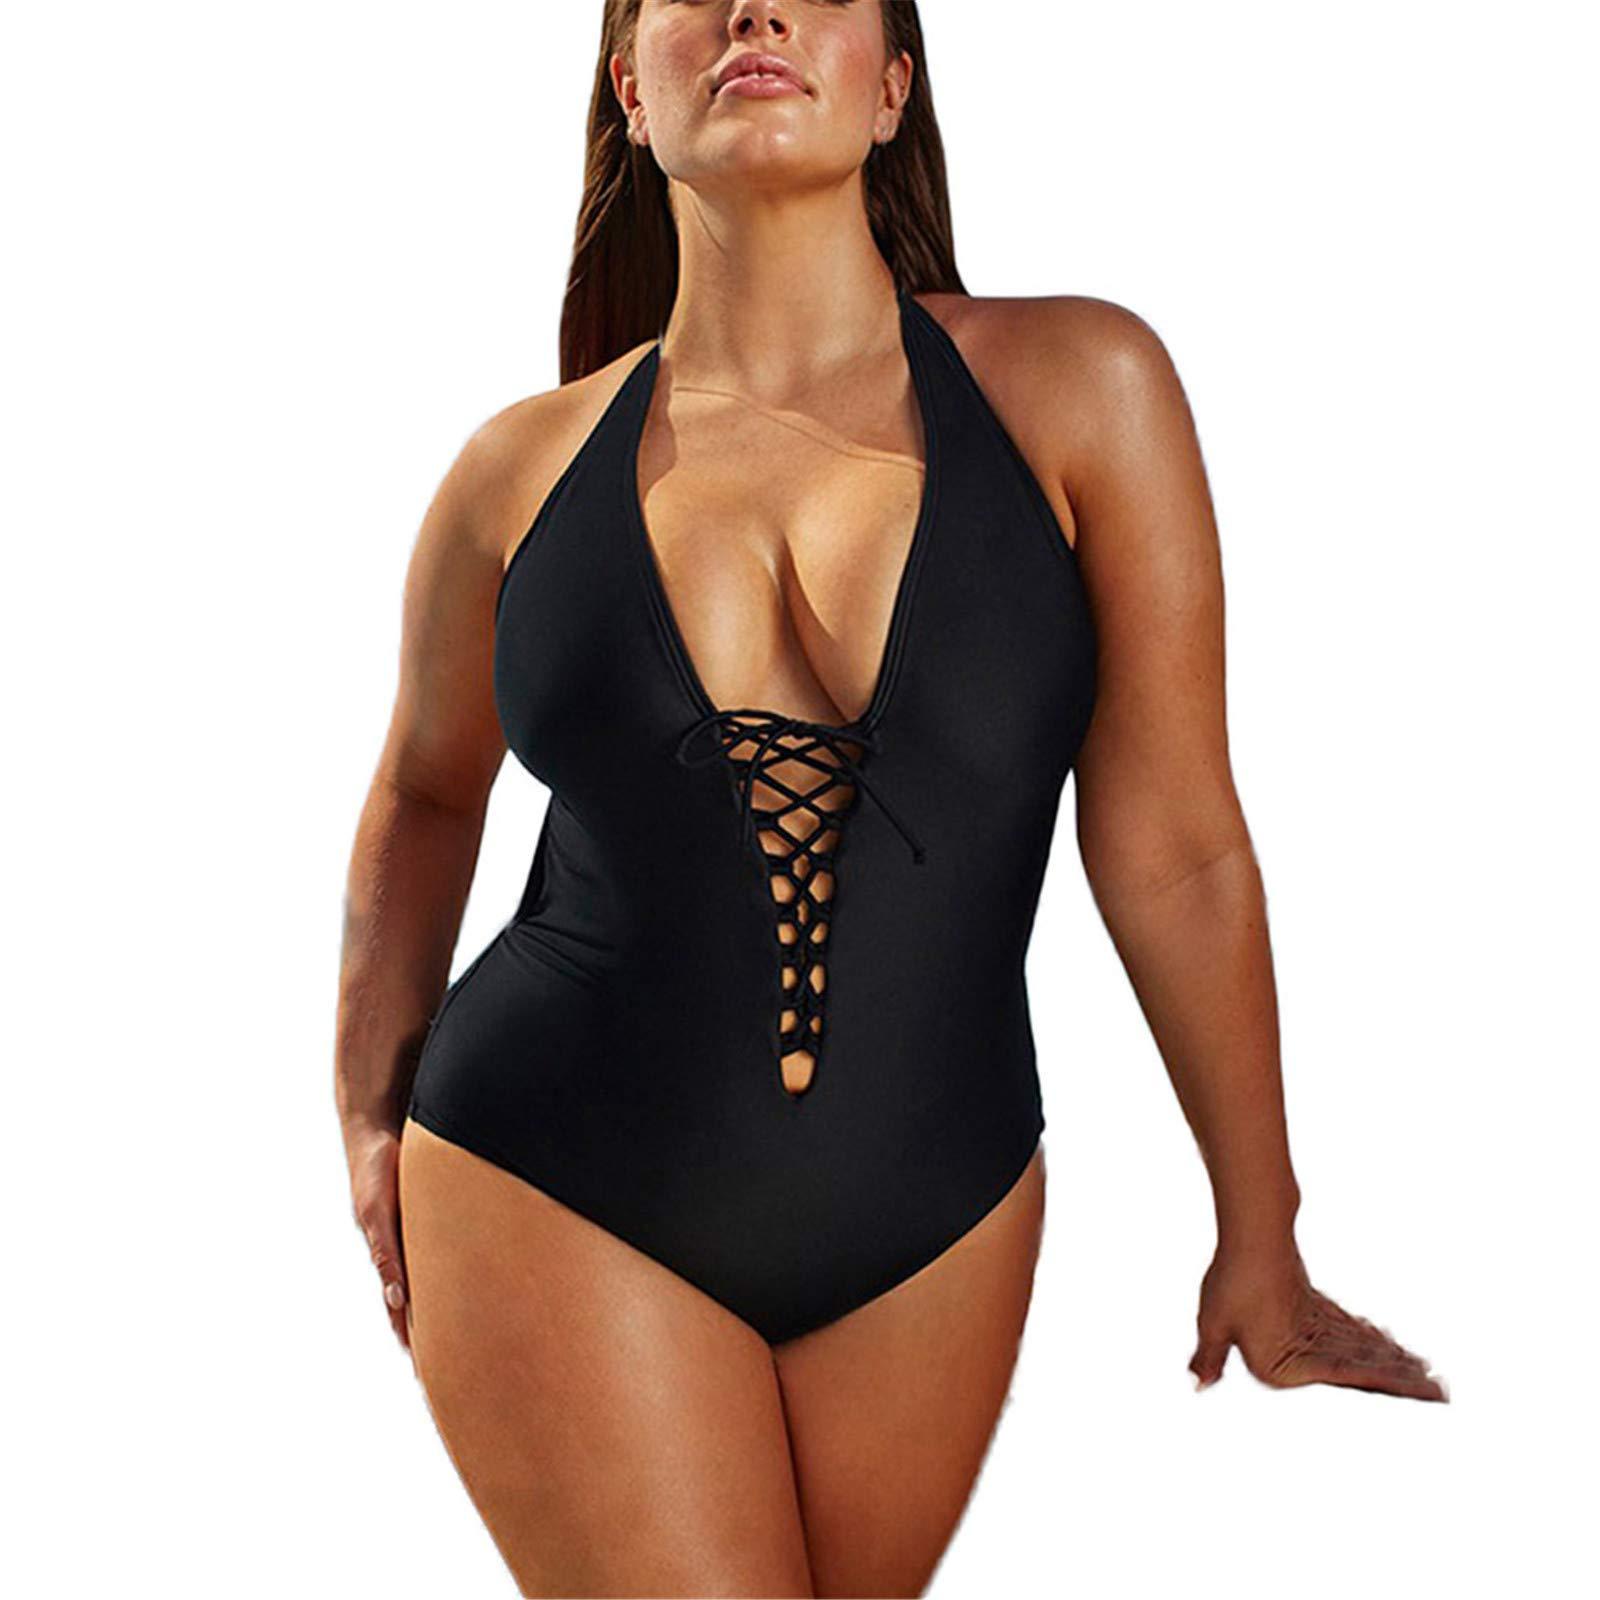 Thenxin Plus Size One Piece Swimsuit for Women Halter Deep V Neck Bandage Slimming Monokini Swimwear(Black,XXXXXL) by Thenxin